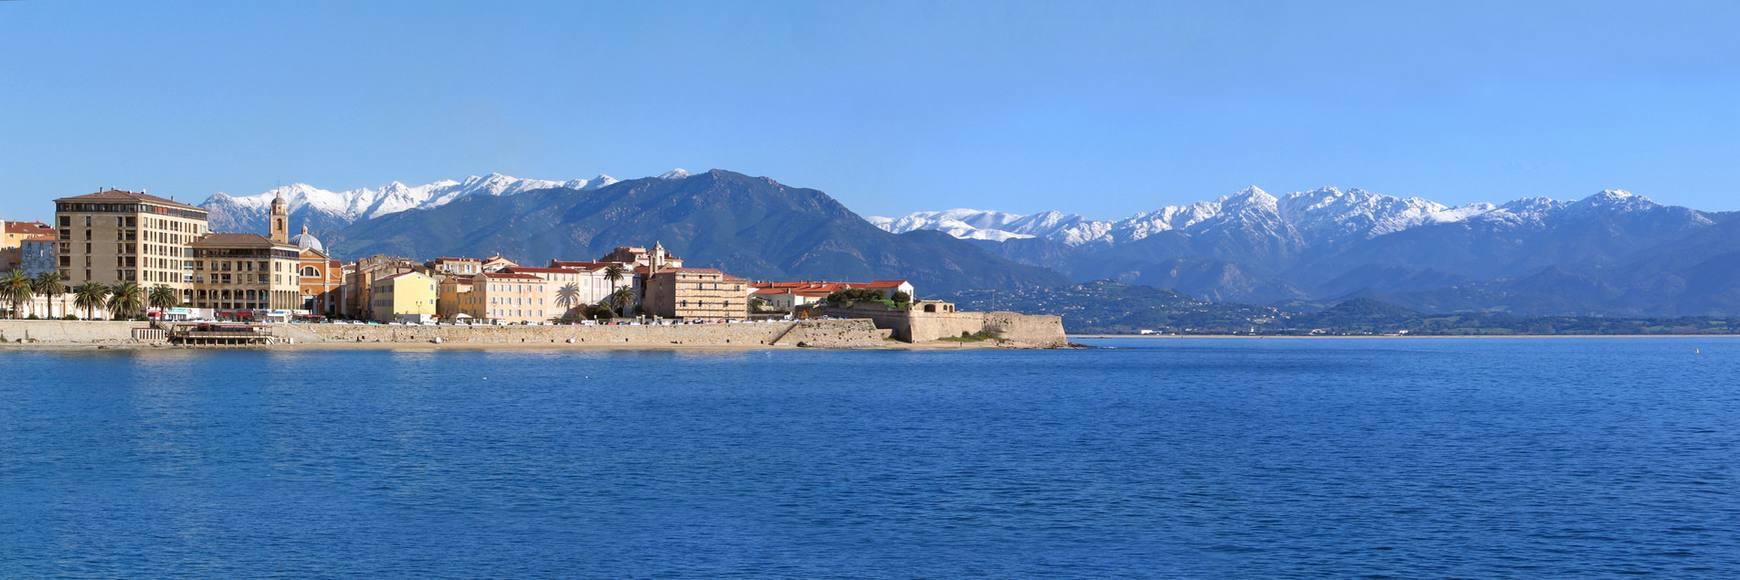 Segelboote mieten Korsika